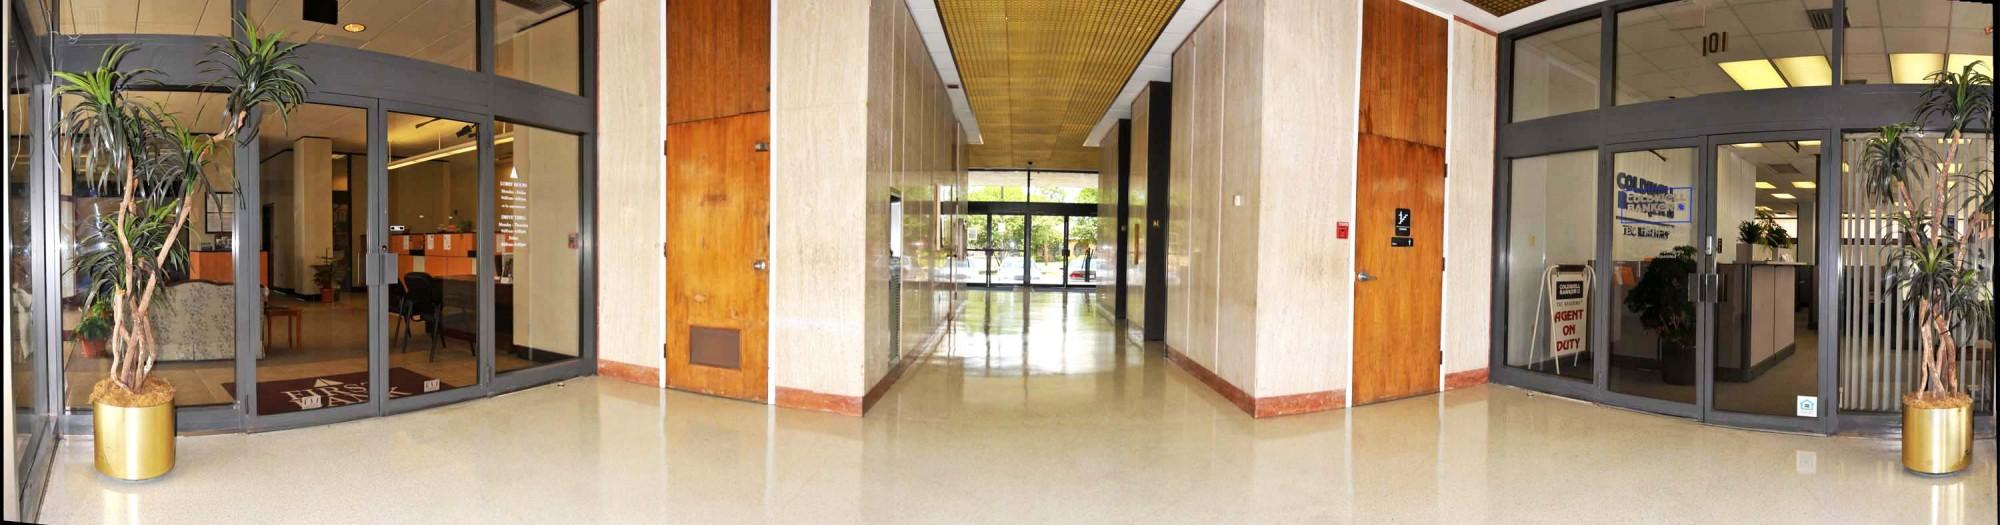 Kailas Companies 4051 Veterans lobby